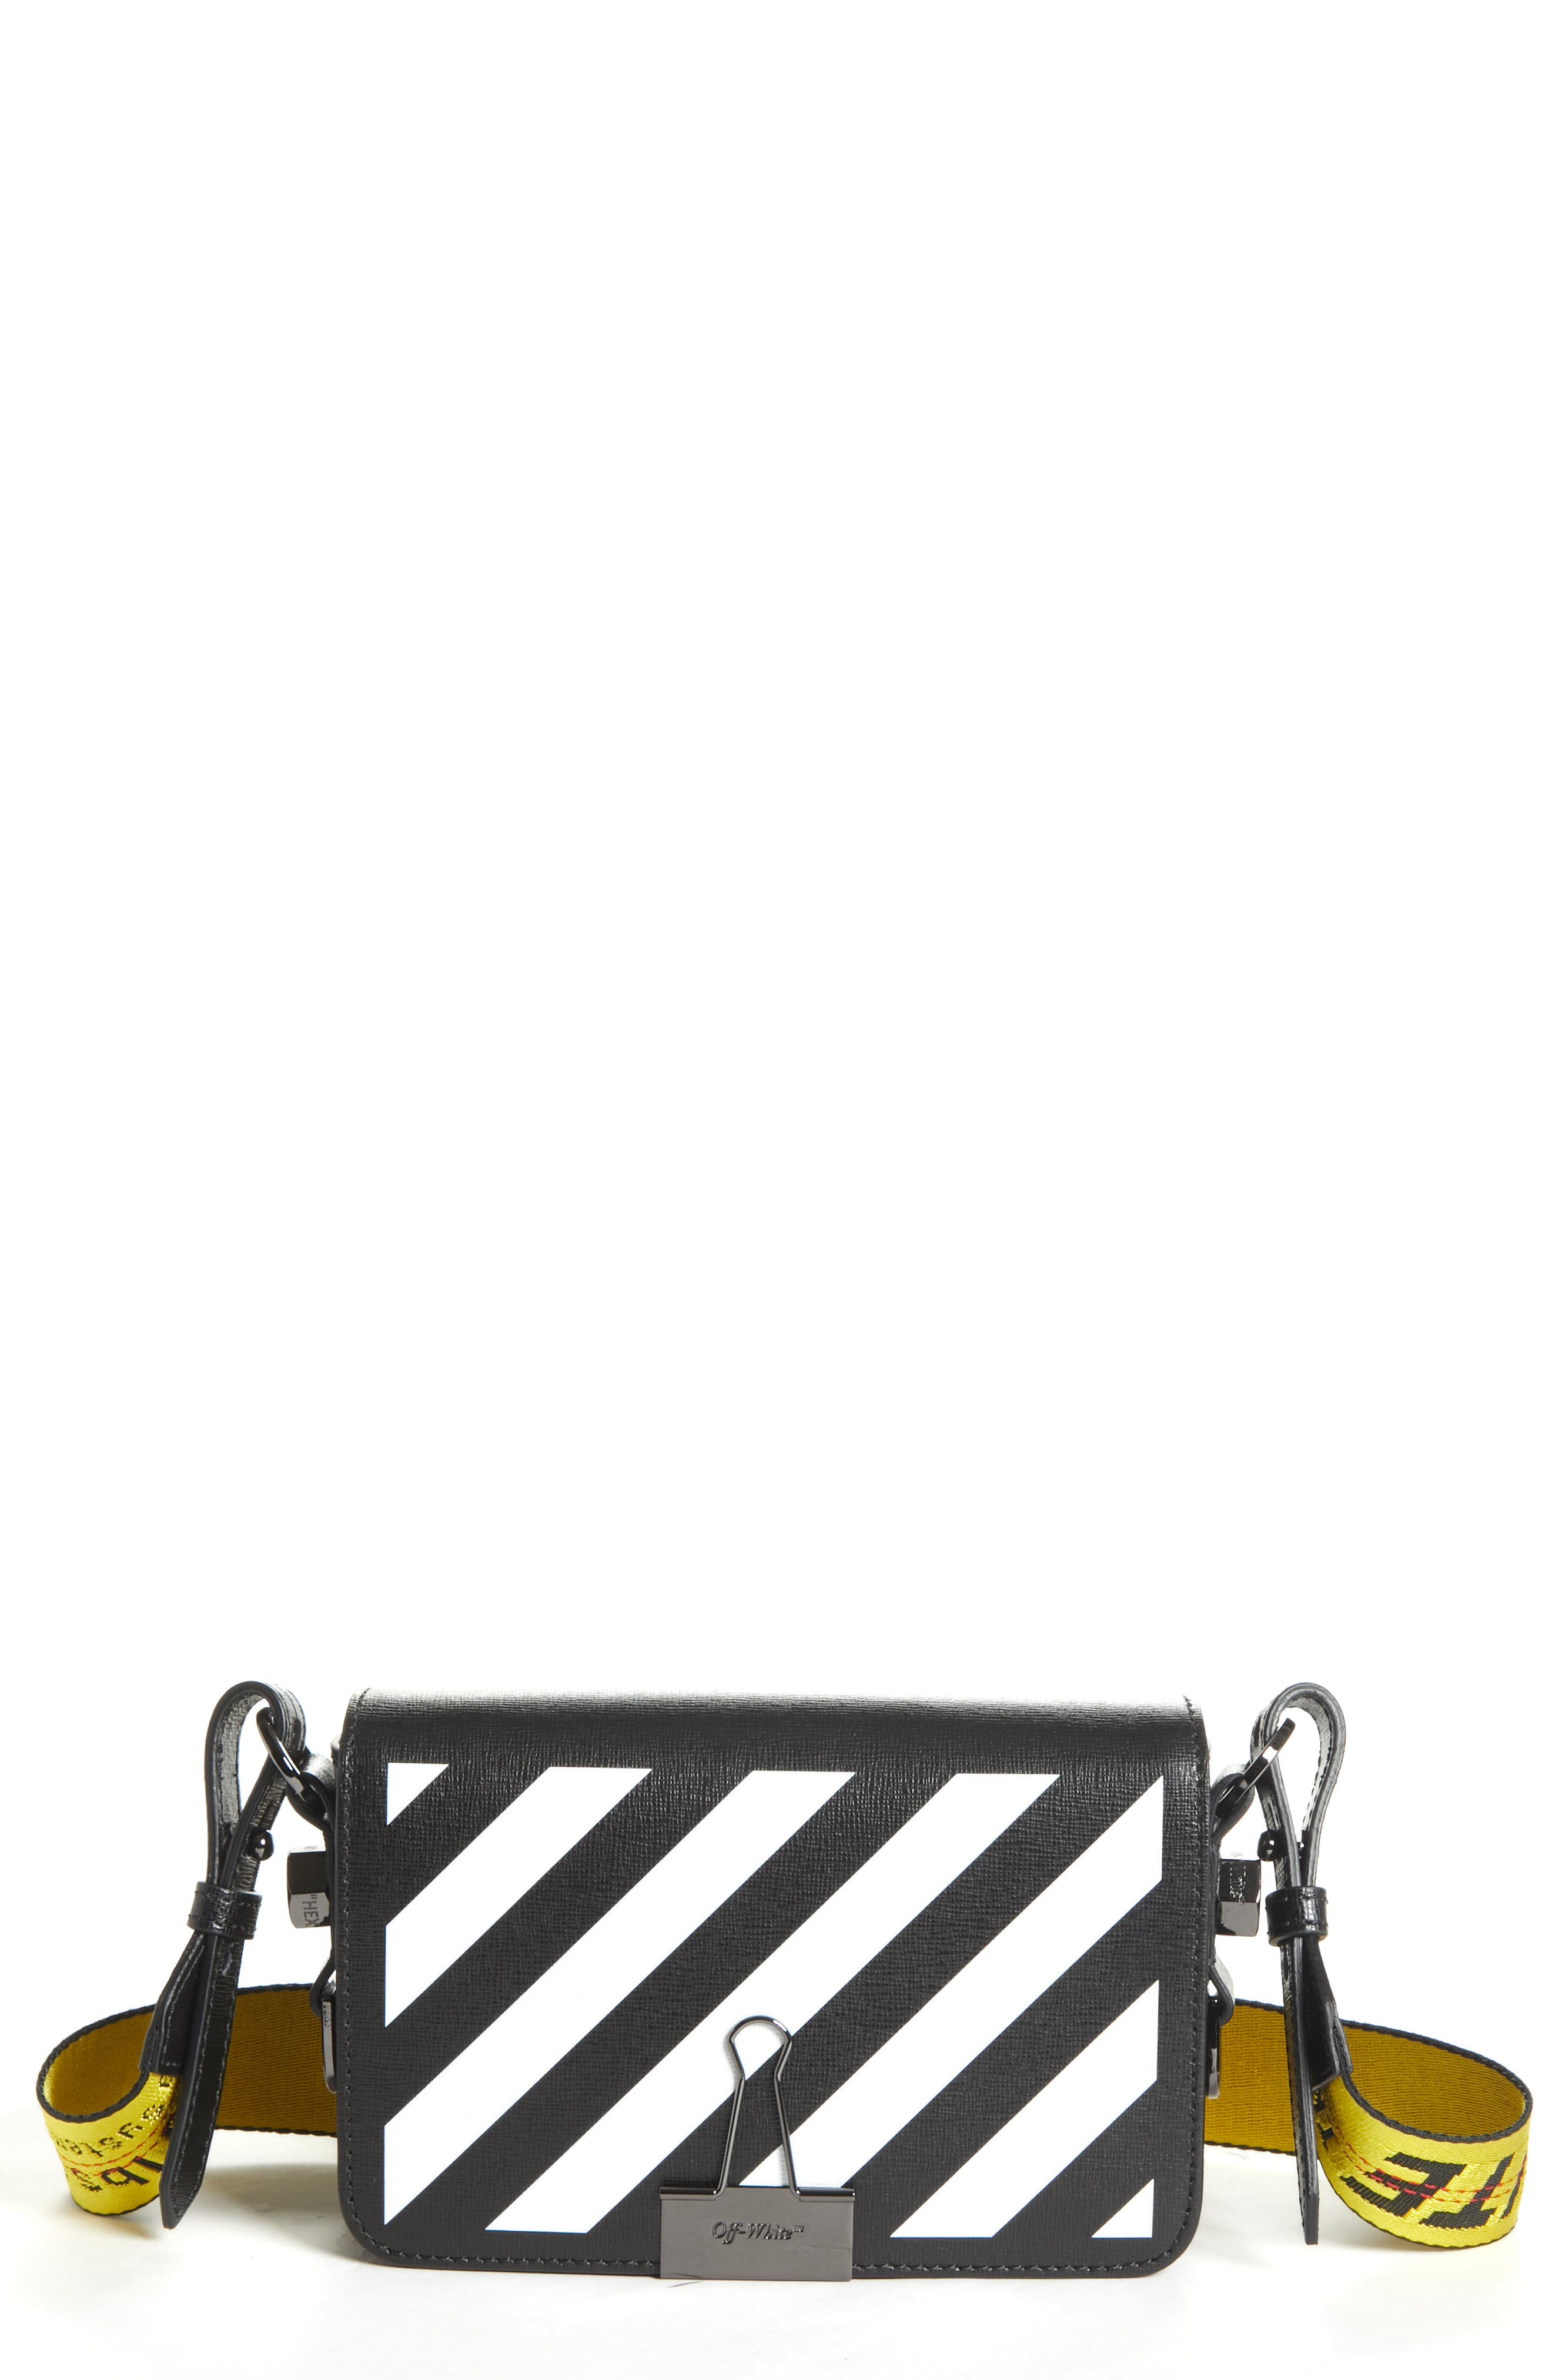 Mini Diagonal Stripe Binder Clip Shoulder Bag in Fucshia White